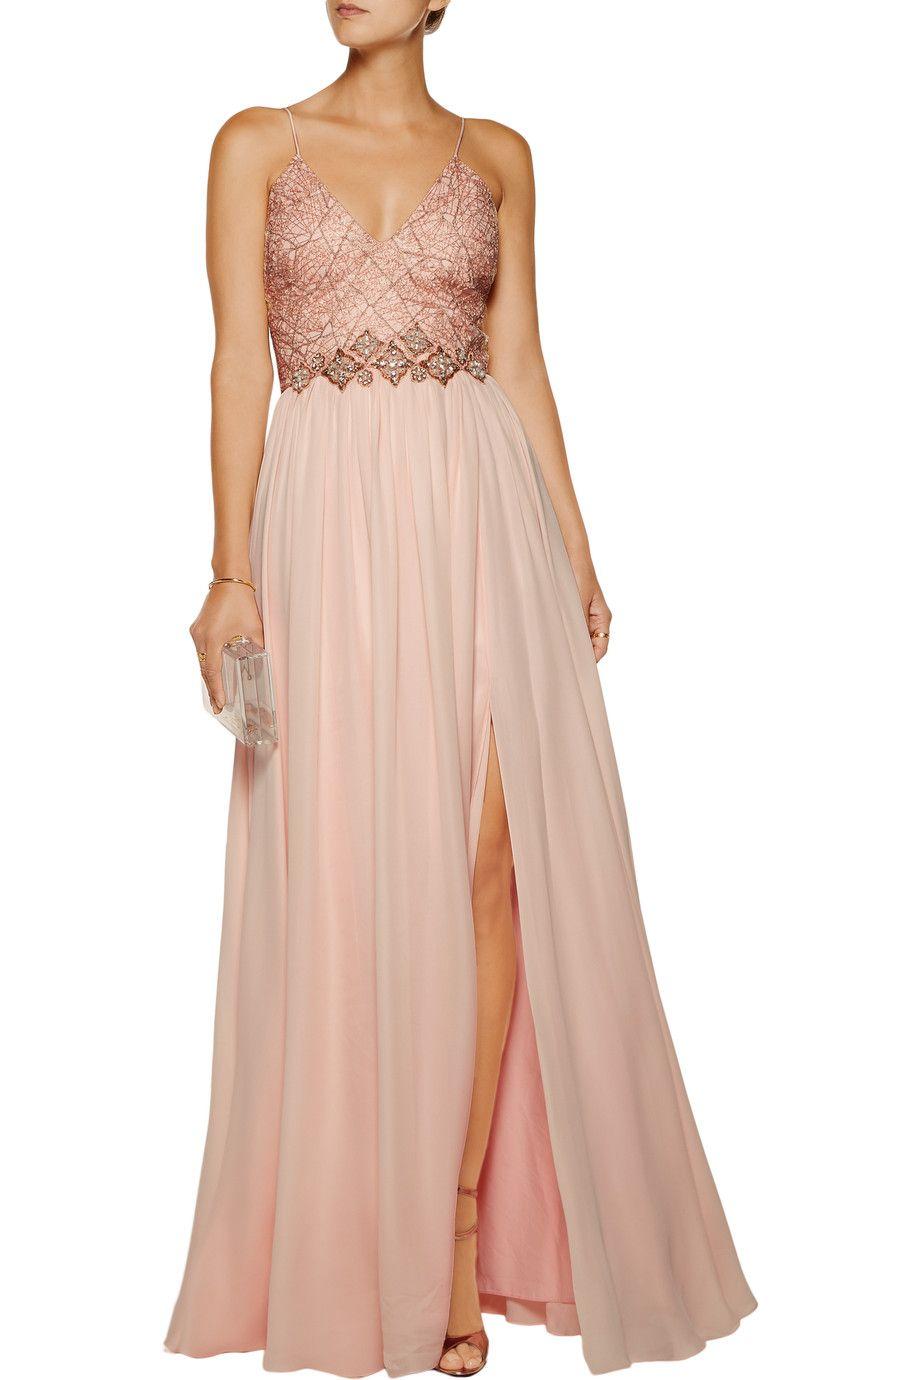 Shop on-sale Badgley Mischka Embellished silk-chiffon gown. Browse ...